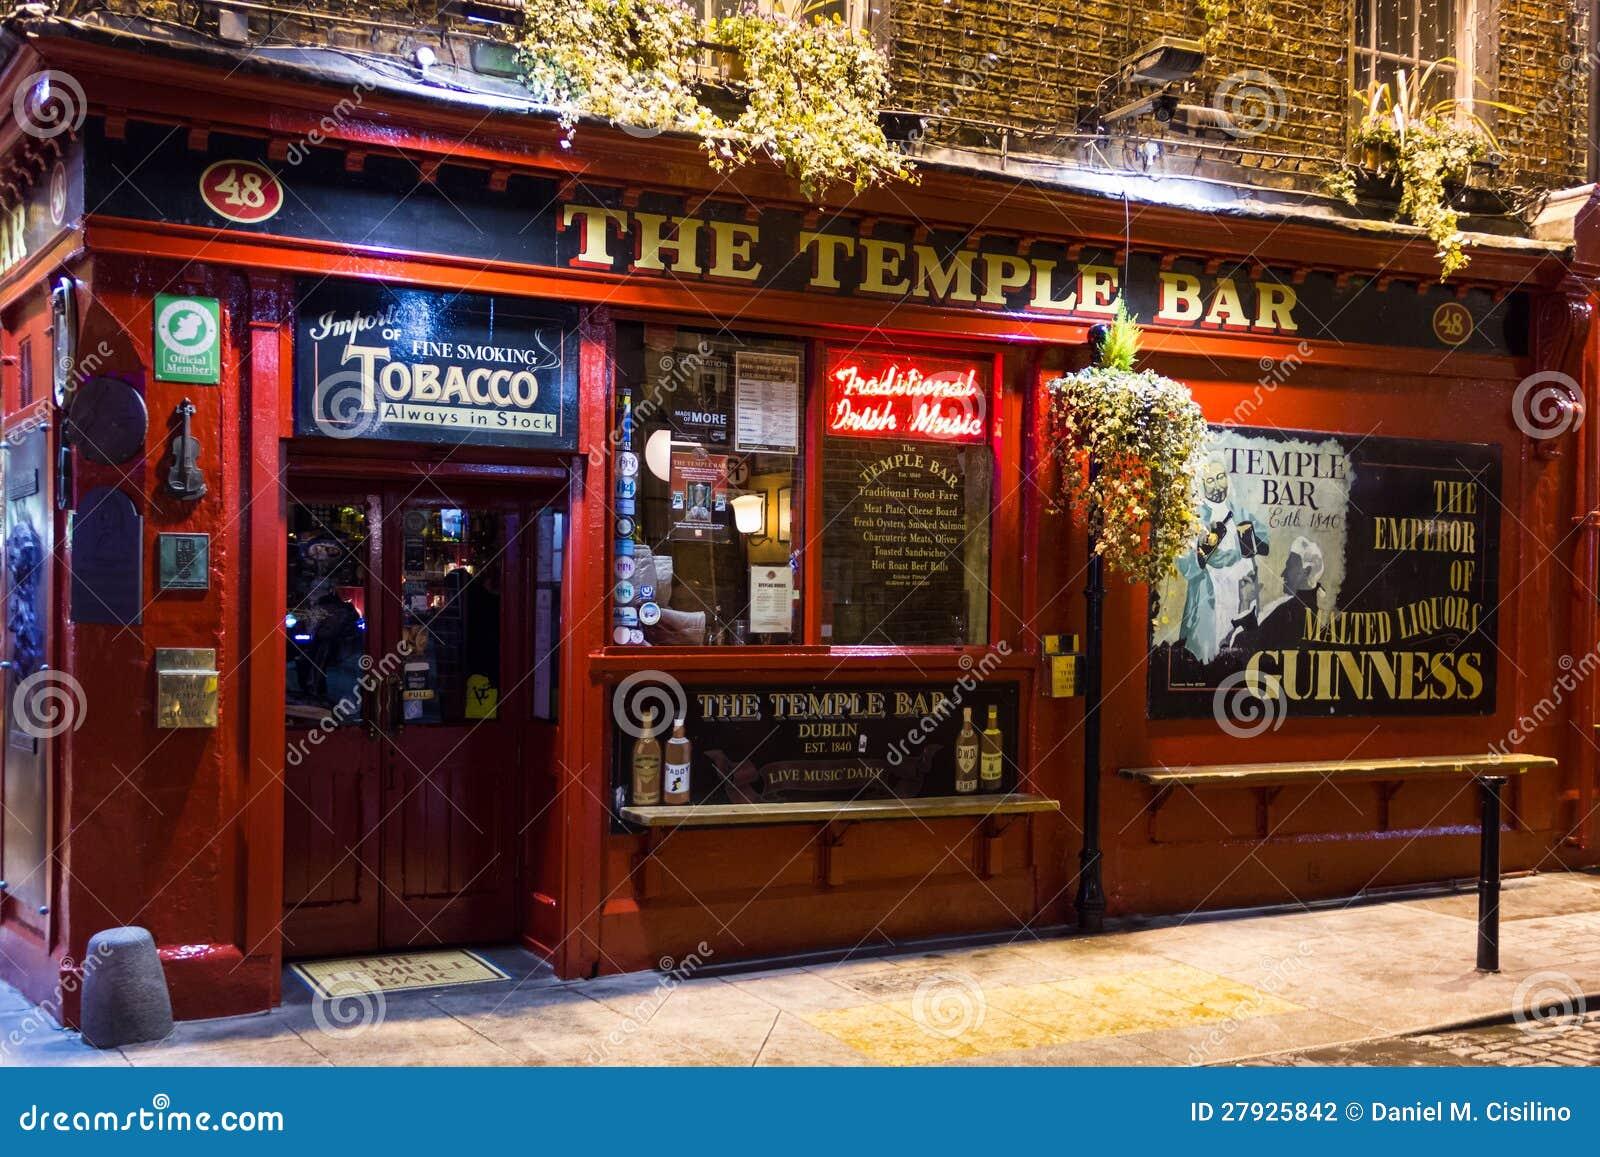 A barra do templo na noite pub irland s dublin - Decoracion pub irlandes ...